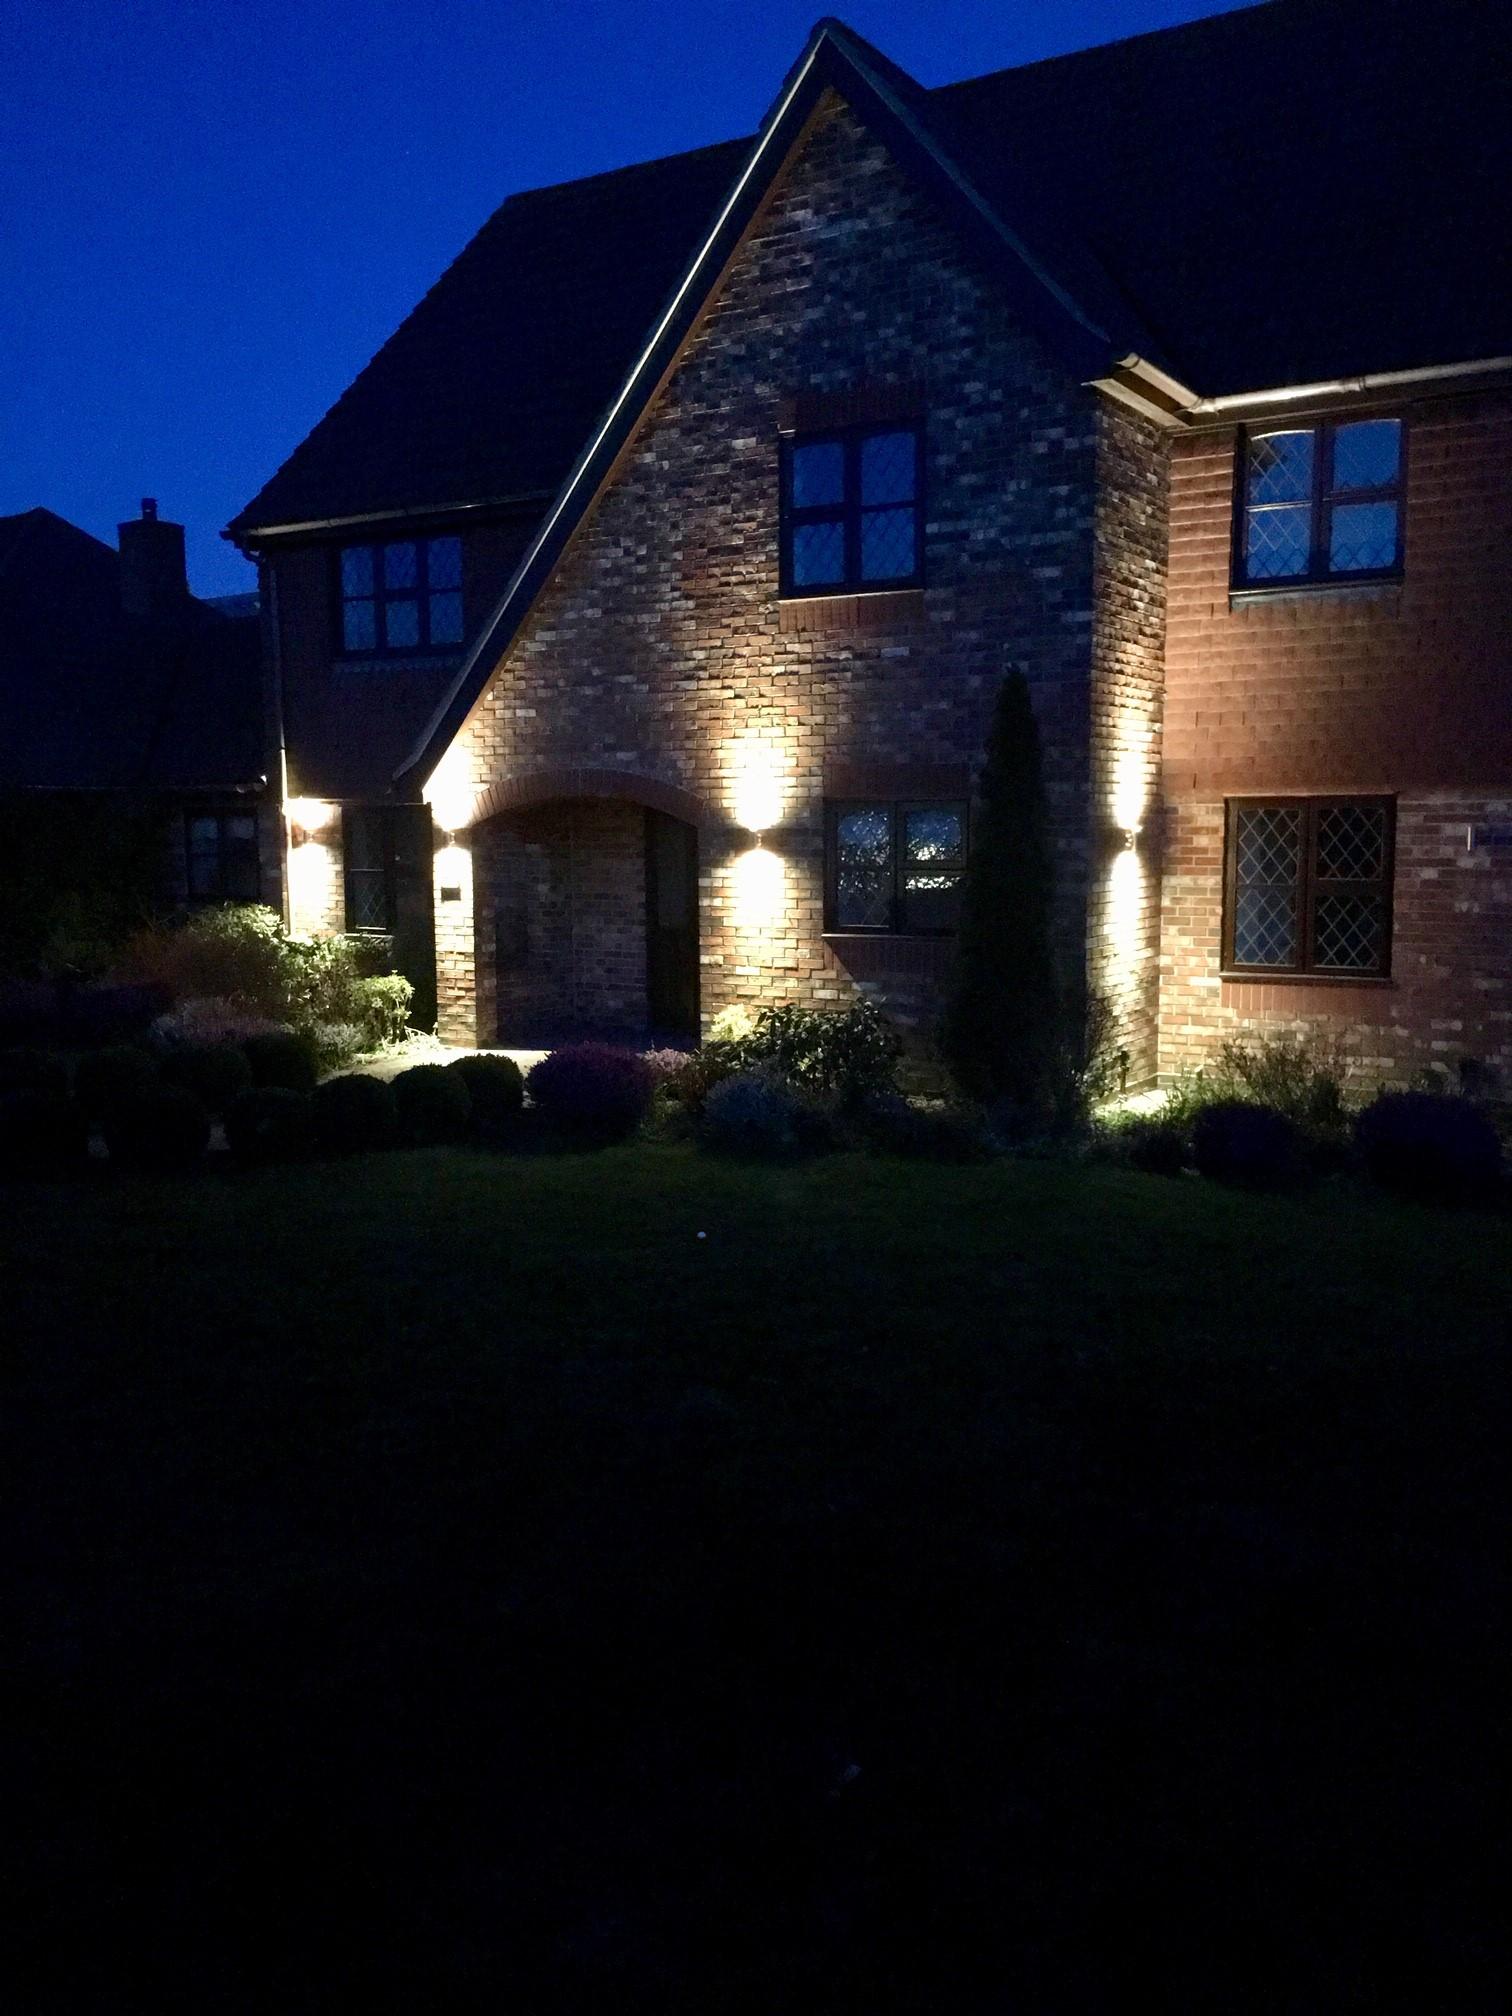 http://www.corepropertysolutions.co.uk/wp-content/uploads/2019/06/lighting1.jpg